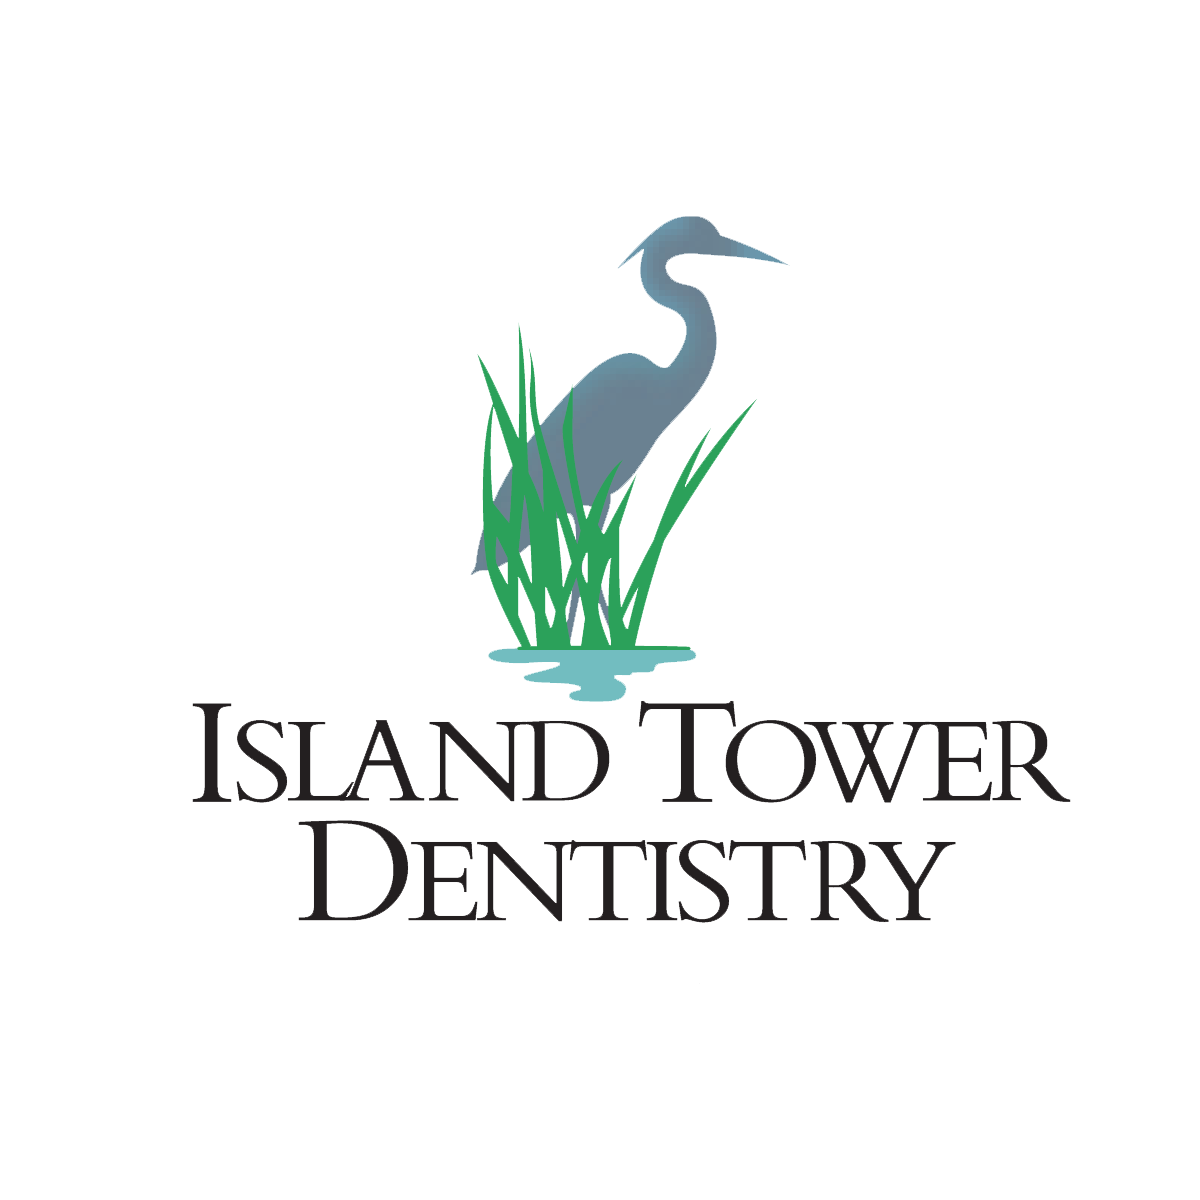 Island Tower Dentistry